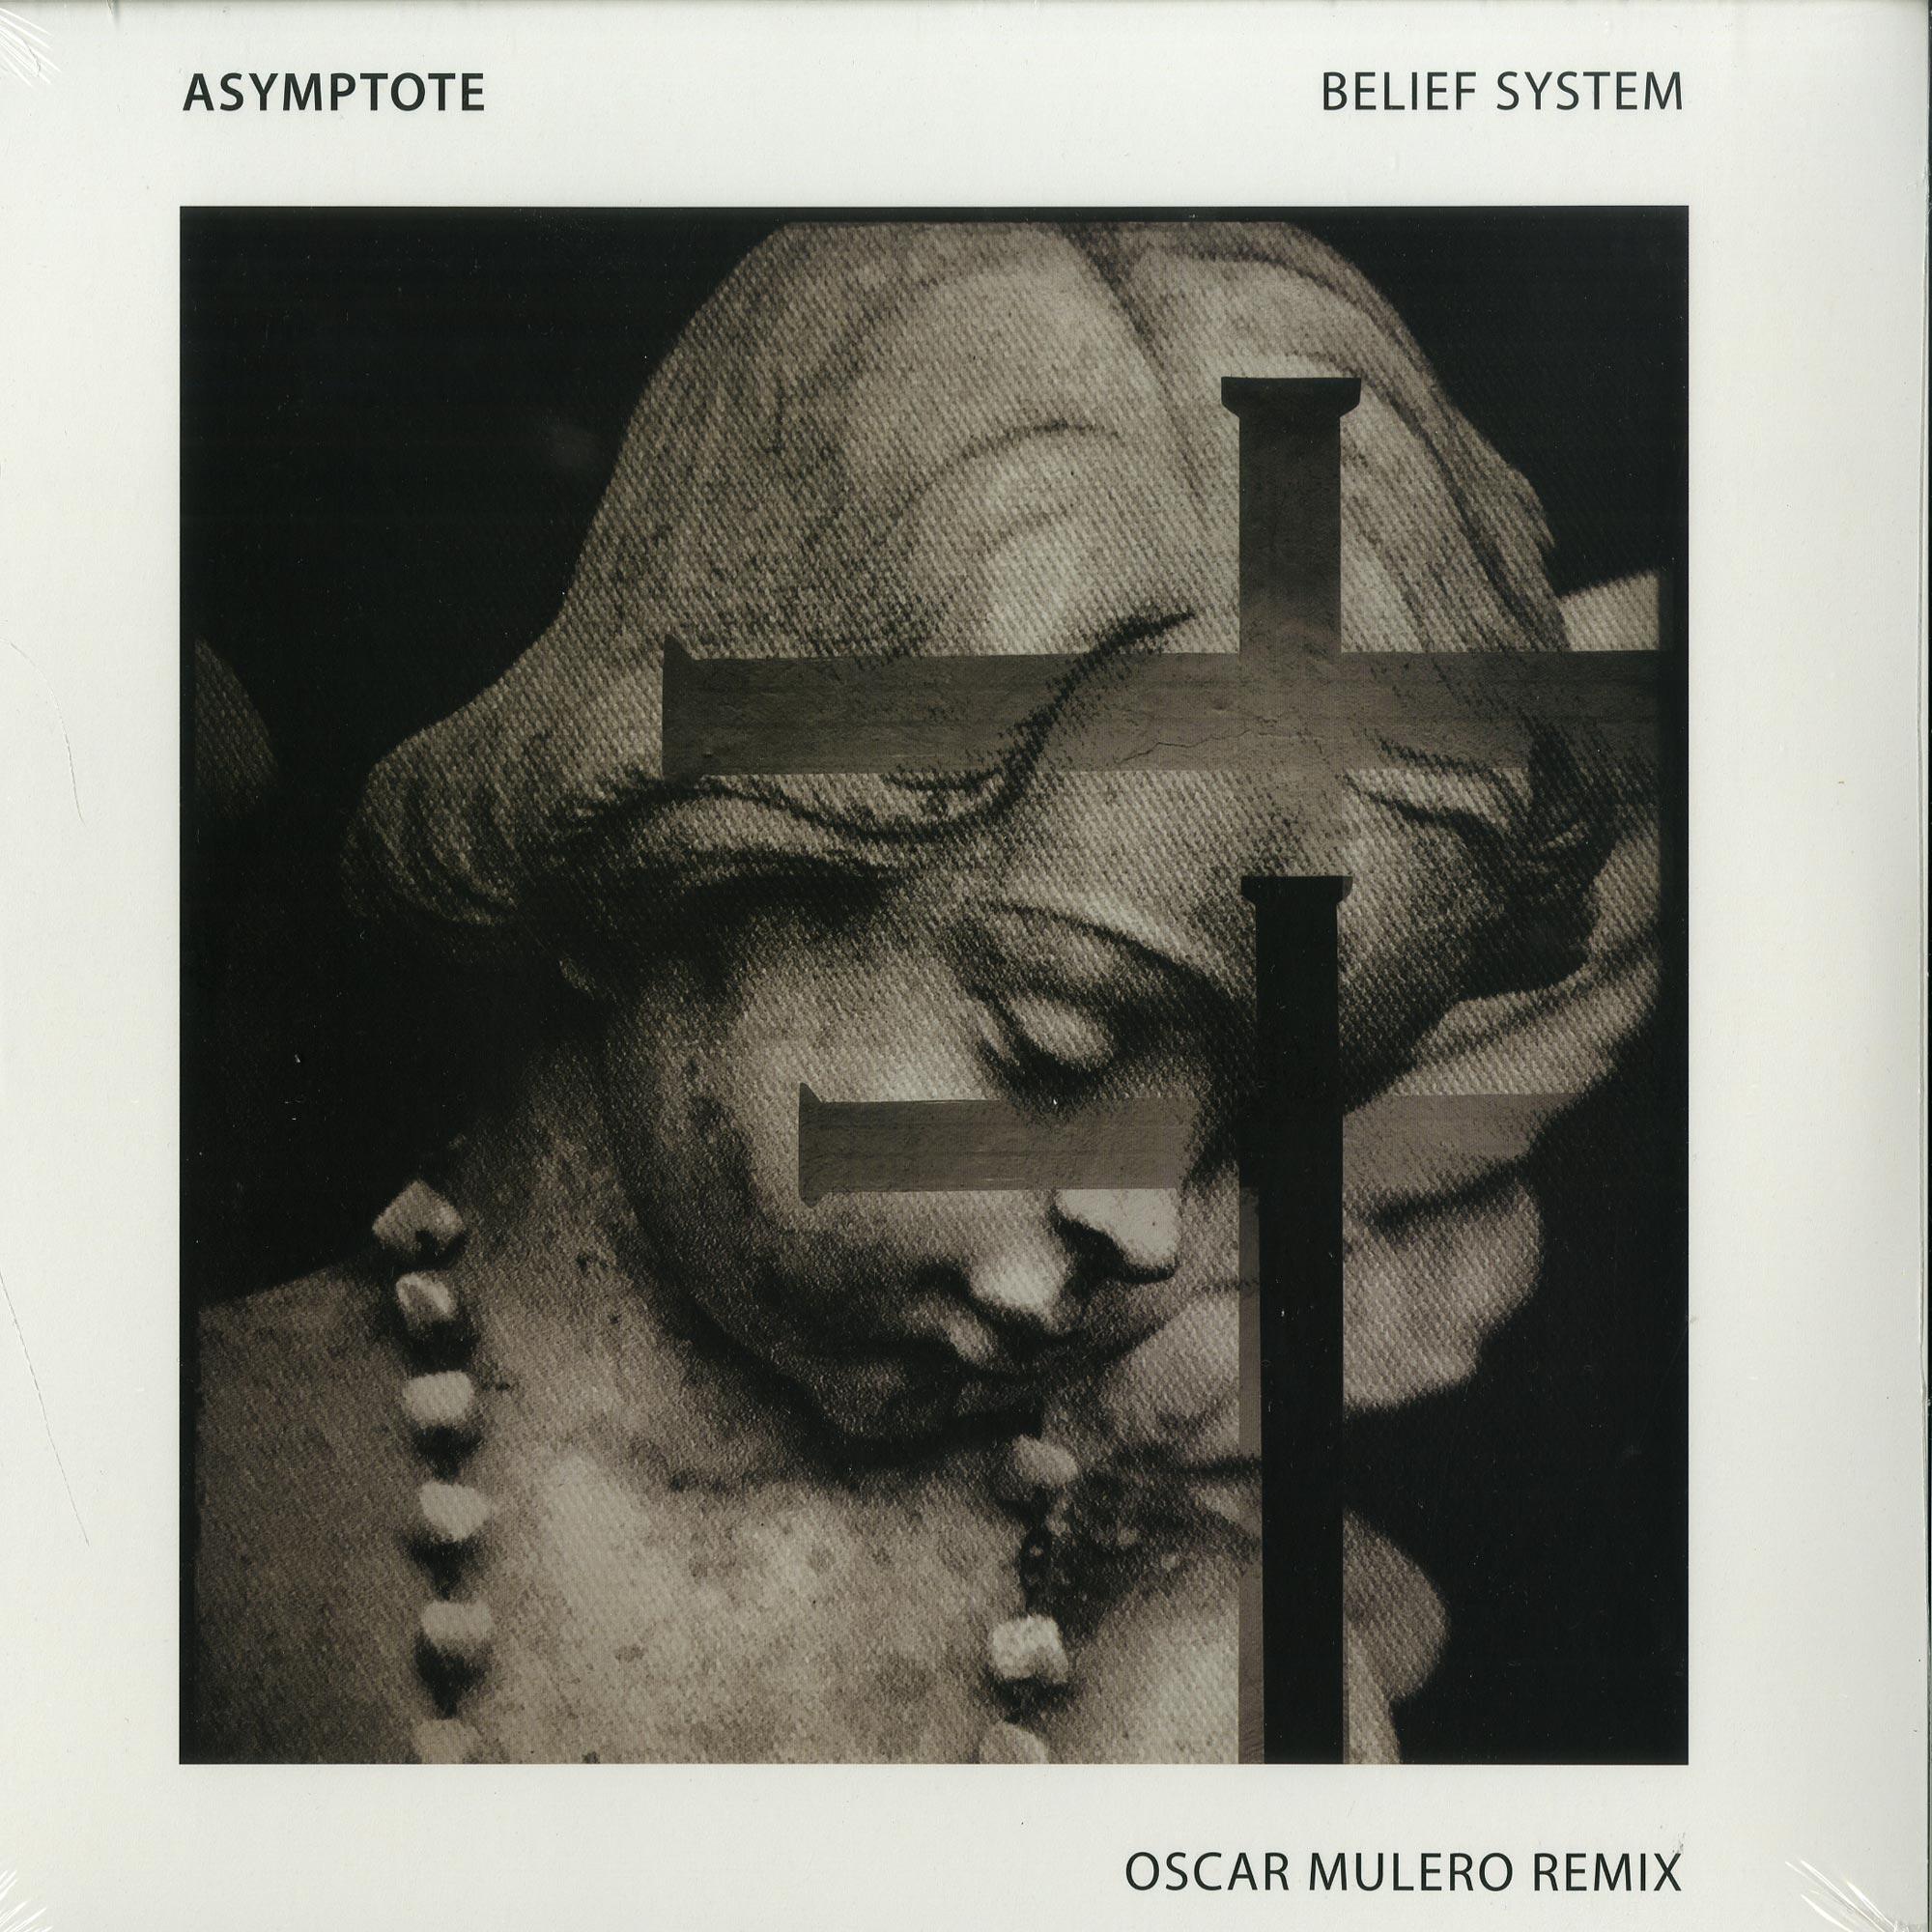 ASYMPTOTE - BELIEF SYSTEM